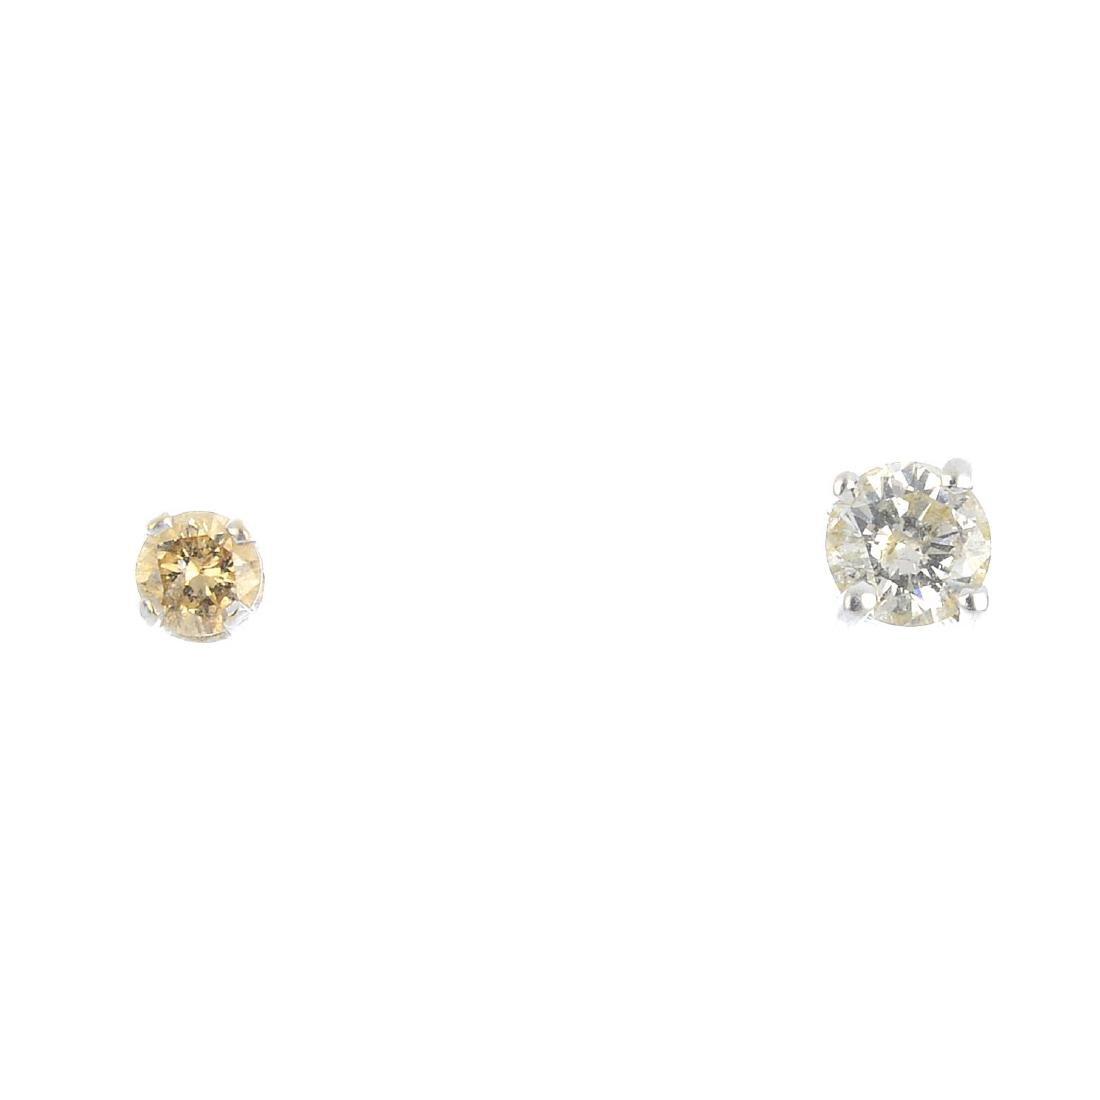 Two single brilliant-cut diamond stud earrings.